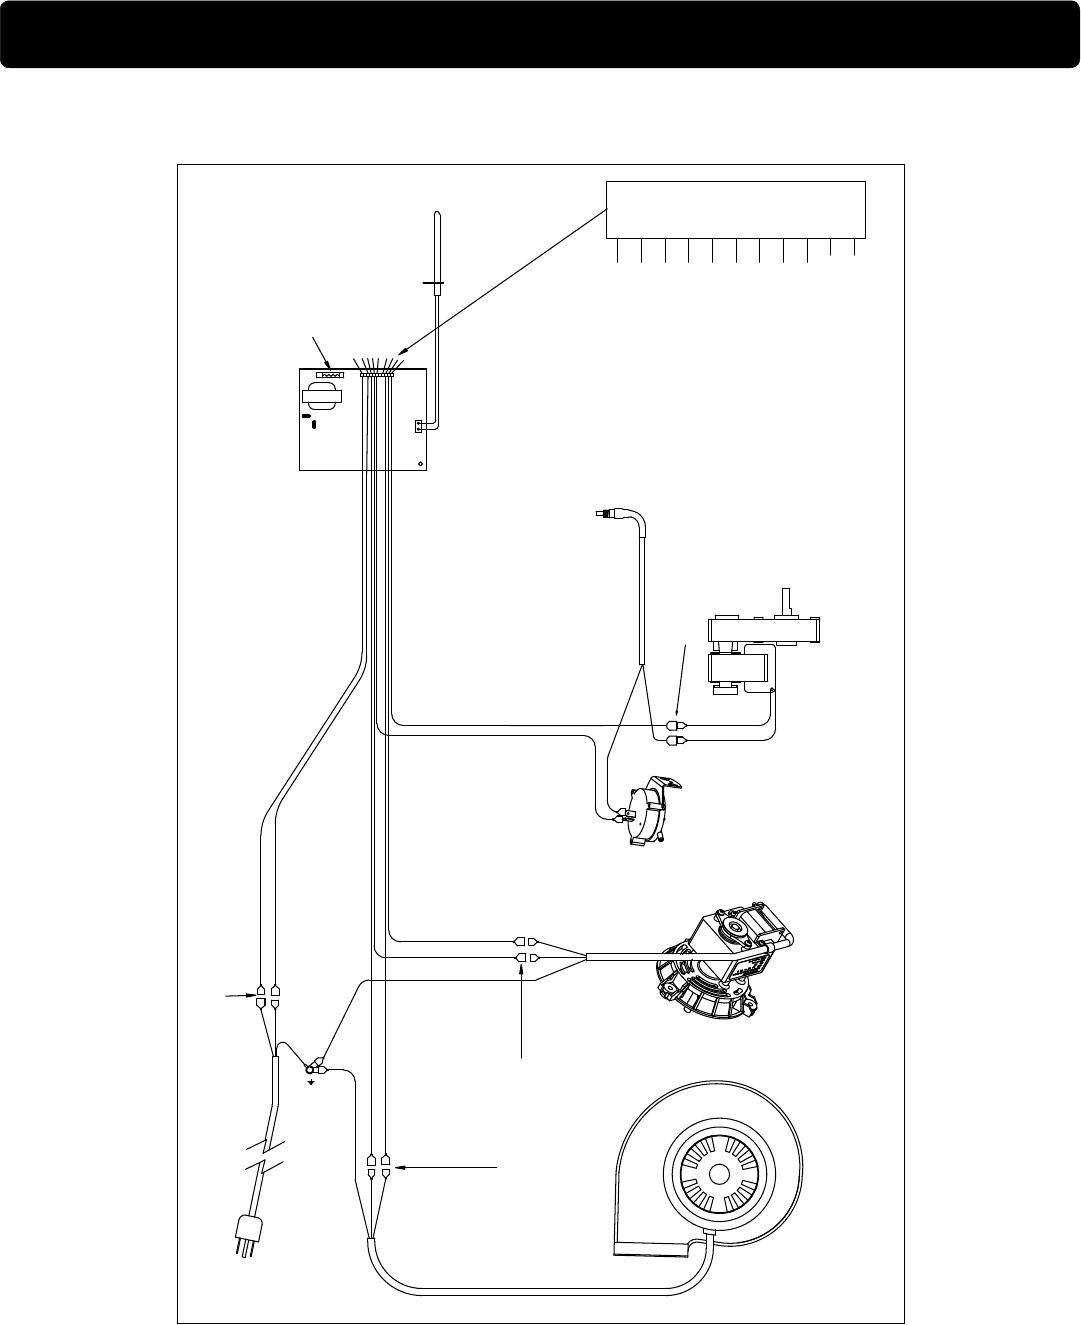 2 wire stove plug wiring diagram speakon speaker harman pp38 43